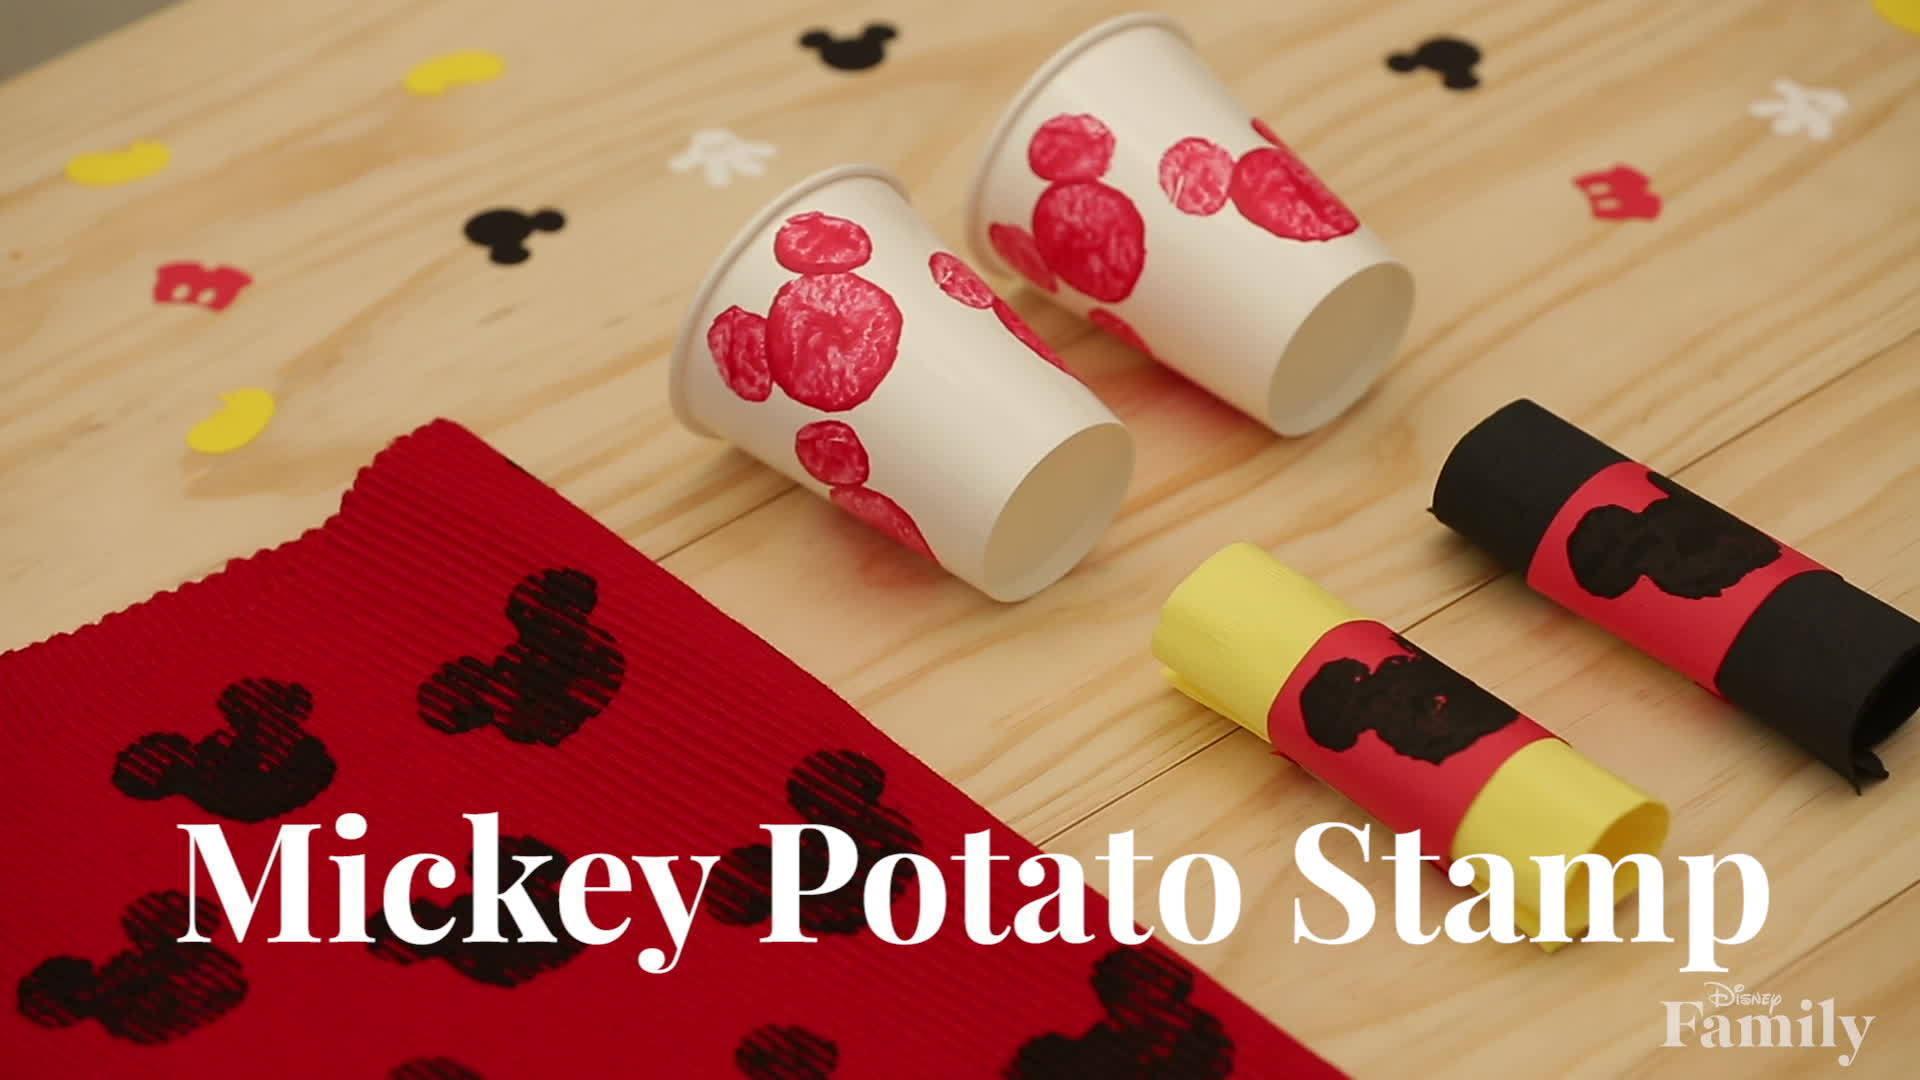 Disney Family: Mickey Potato Stamp DIY